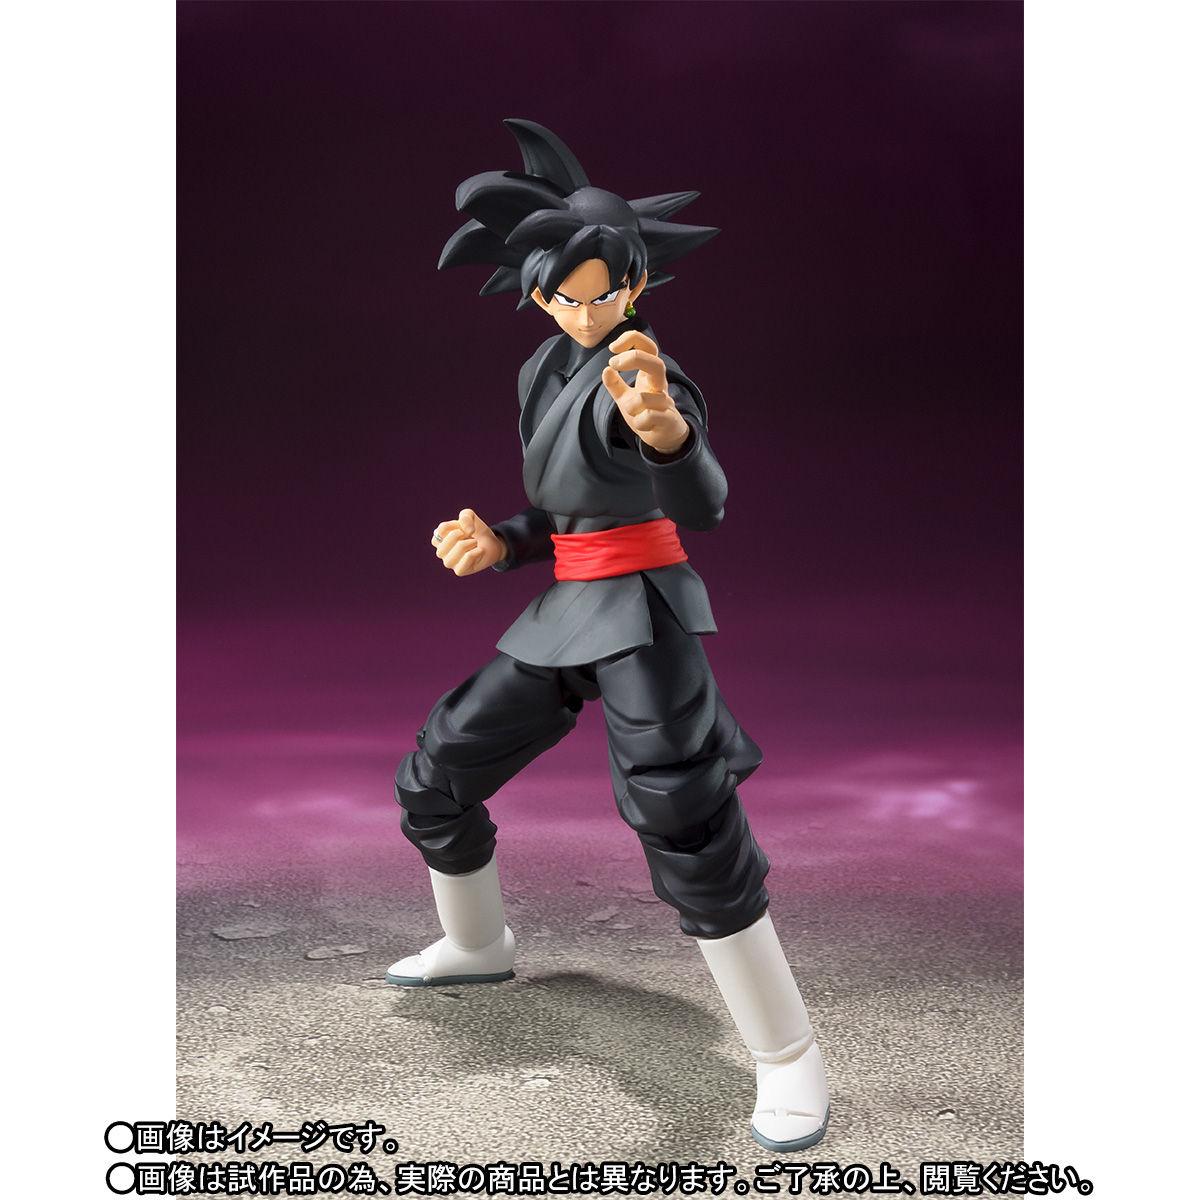 S.H. Figuarts Dragon Ball Z Goku In Black Suit Figure Pre-Orders